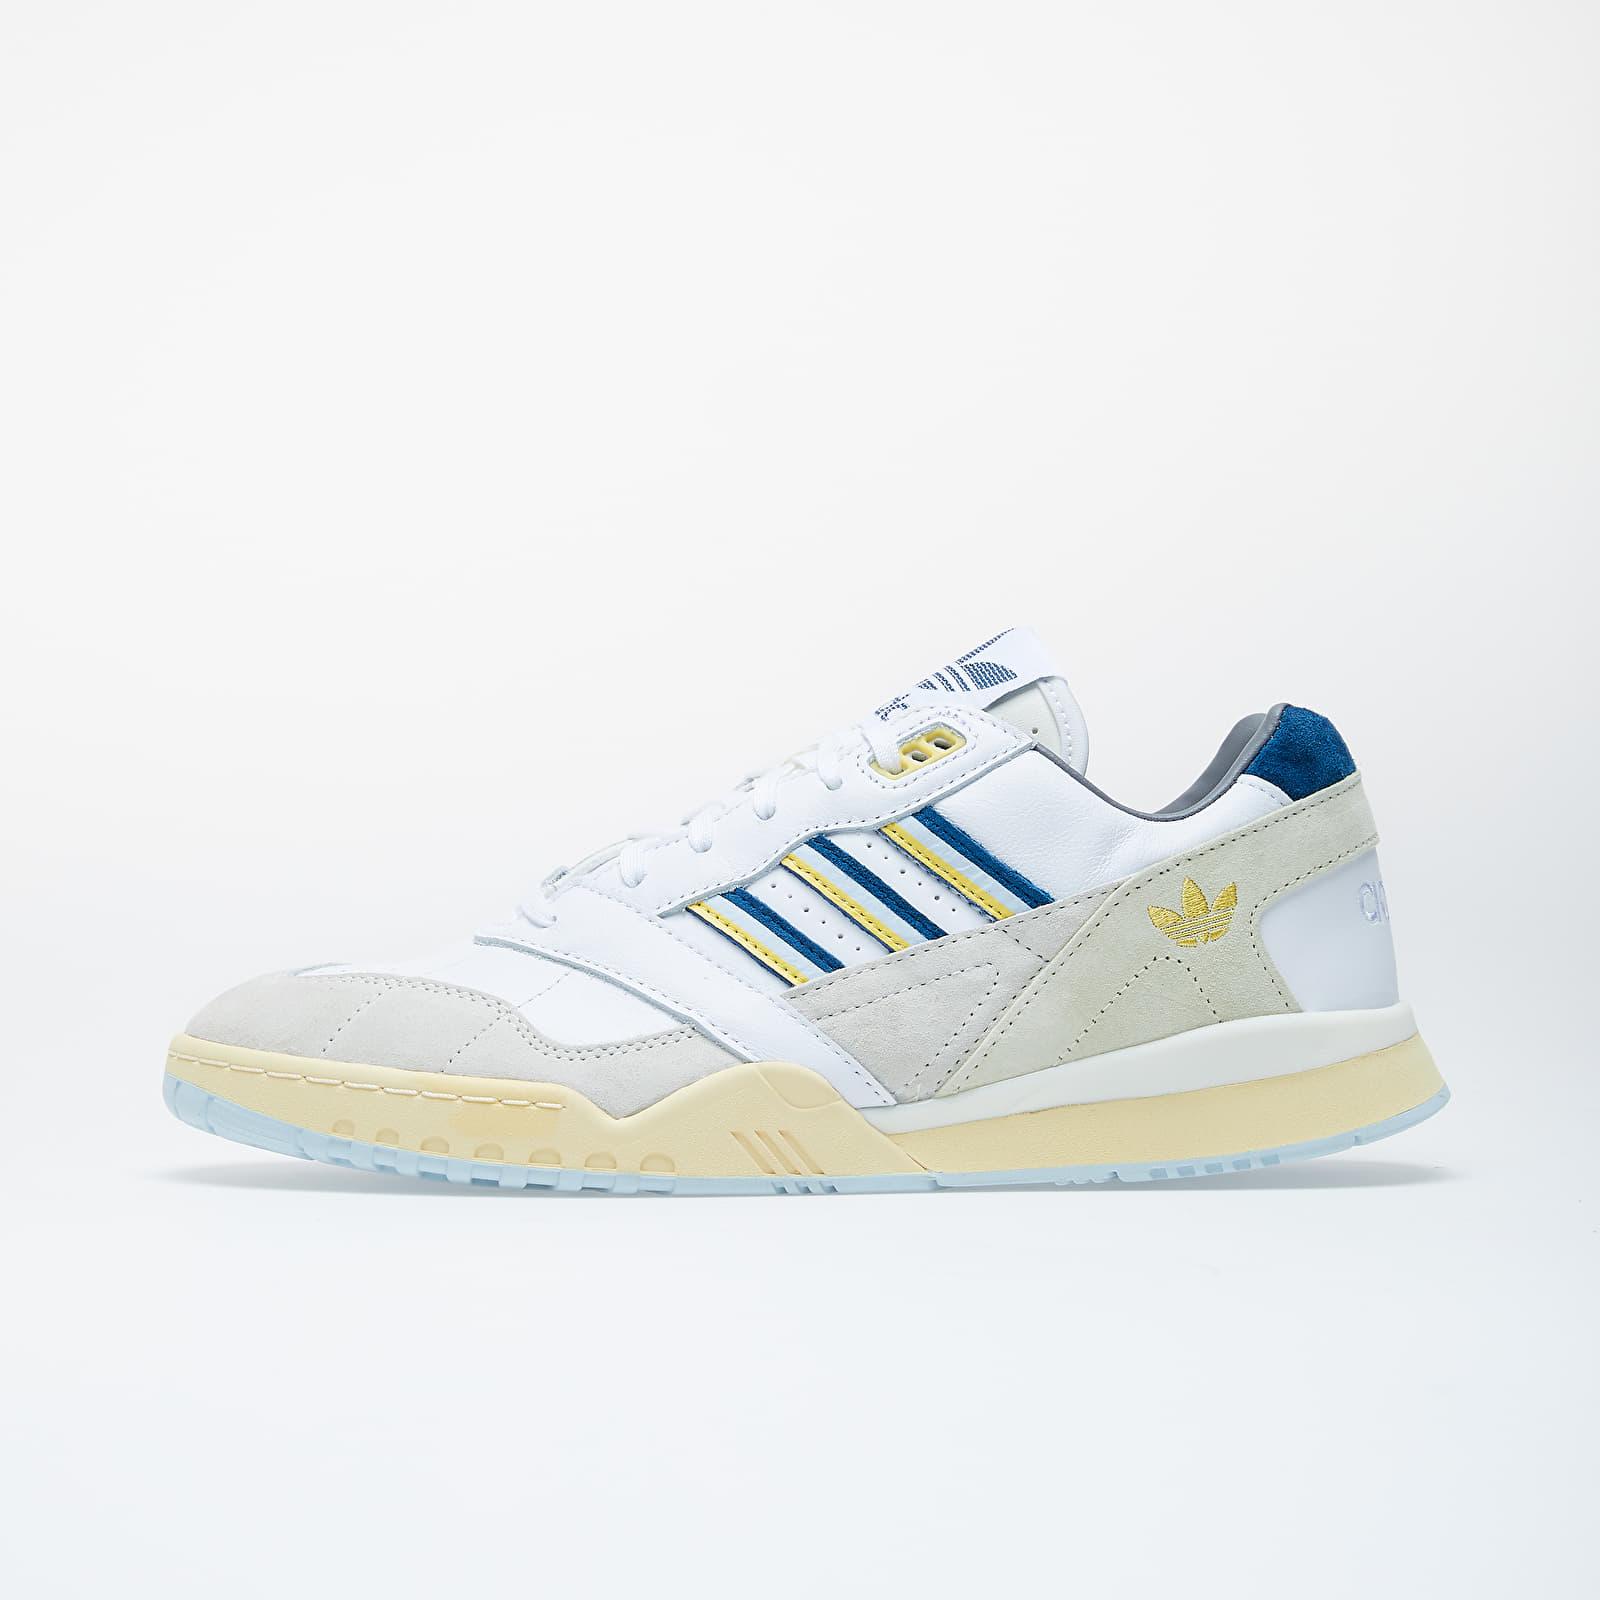 Pánské tenisky a boty adidas A.R. Trainer Ftw White/ Legend Marine/ Spirit Yellow